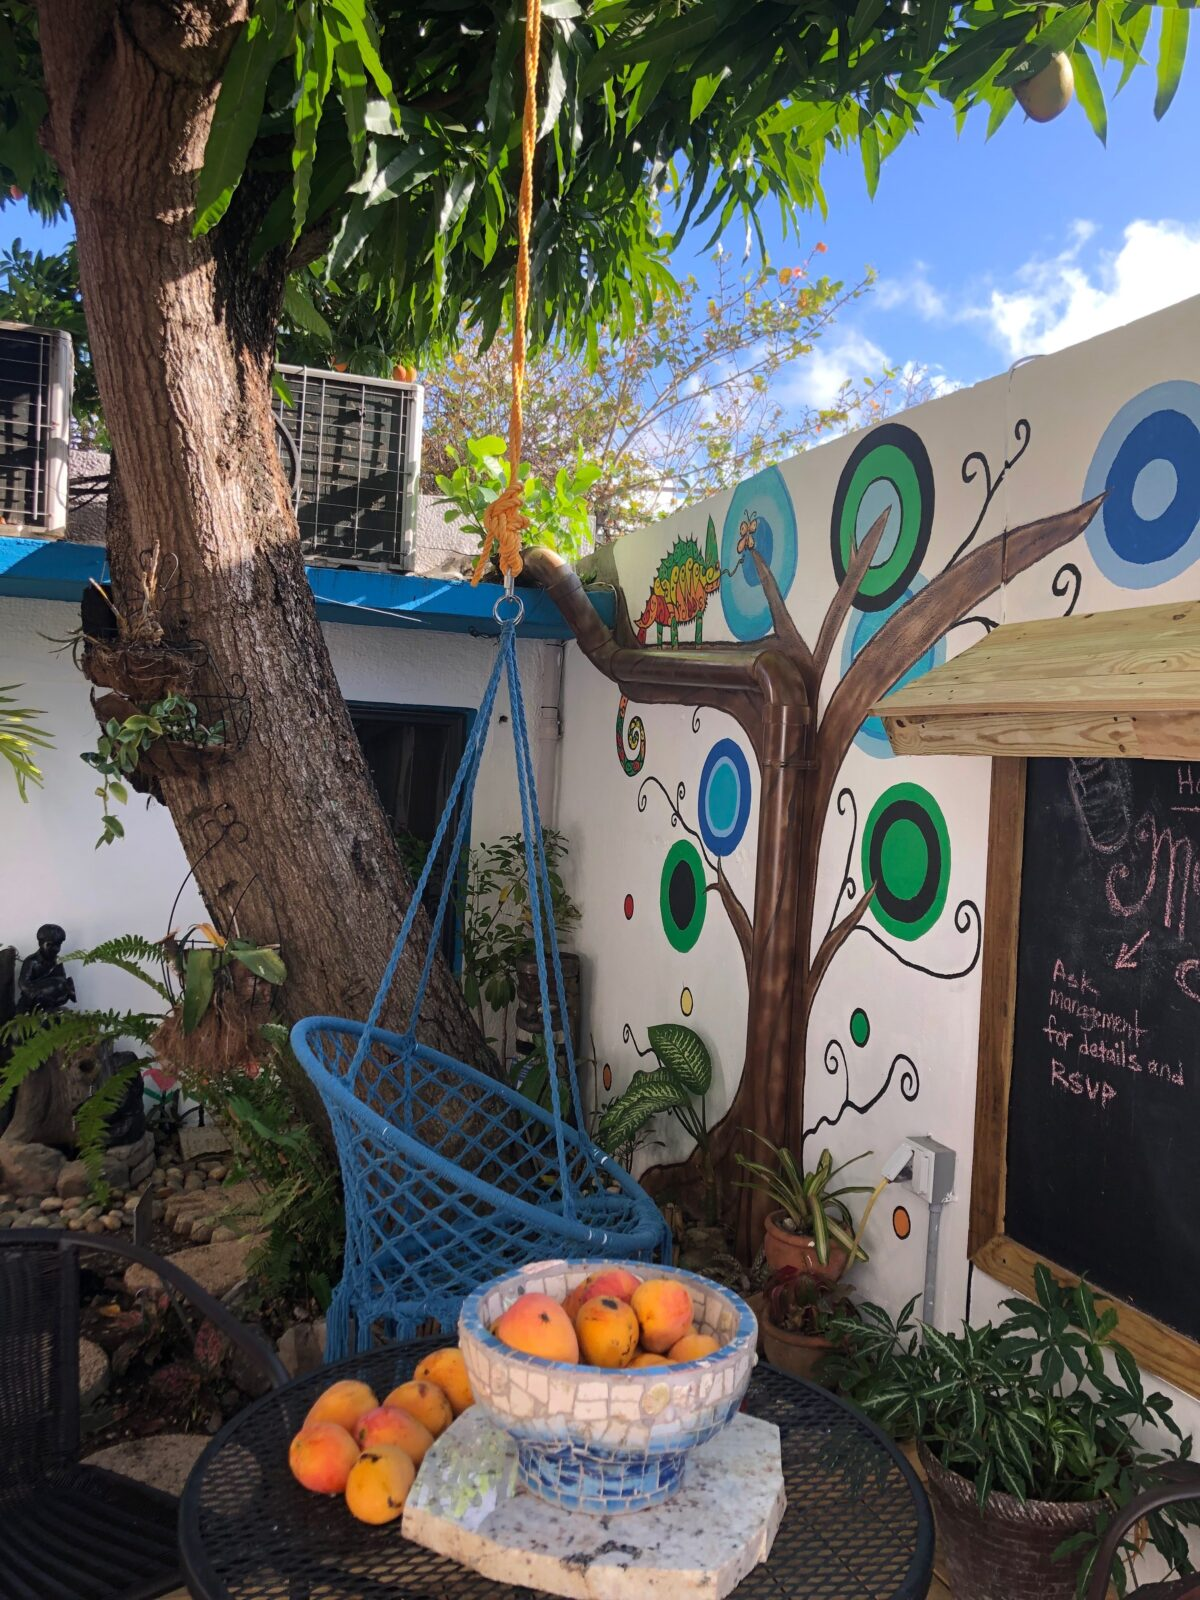 mango tree with grafiti wall